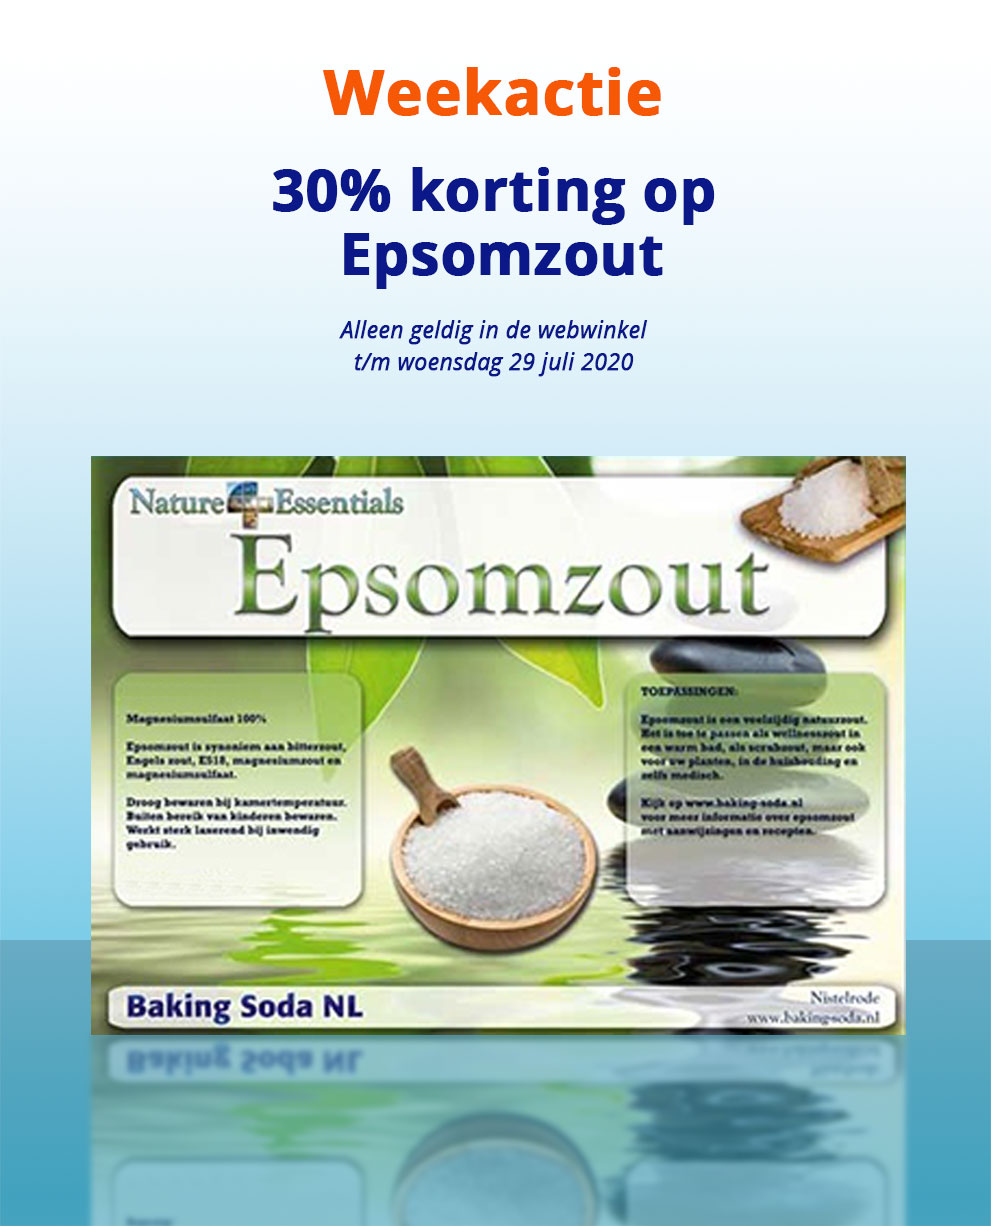 Weekactie-epsomzout-juli2020-bakingsoda-nl